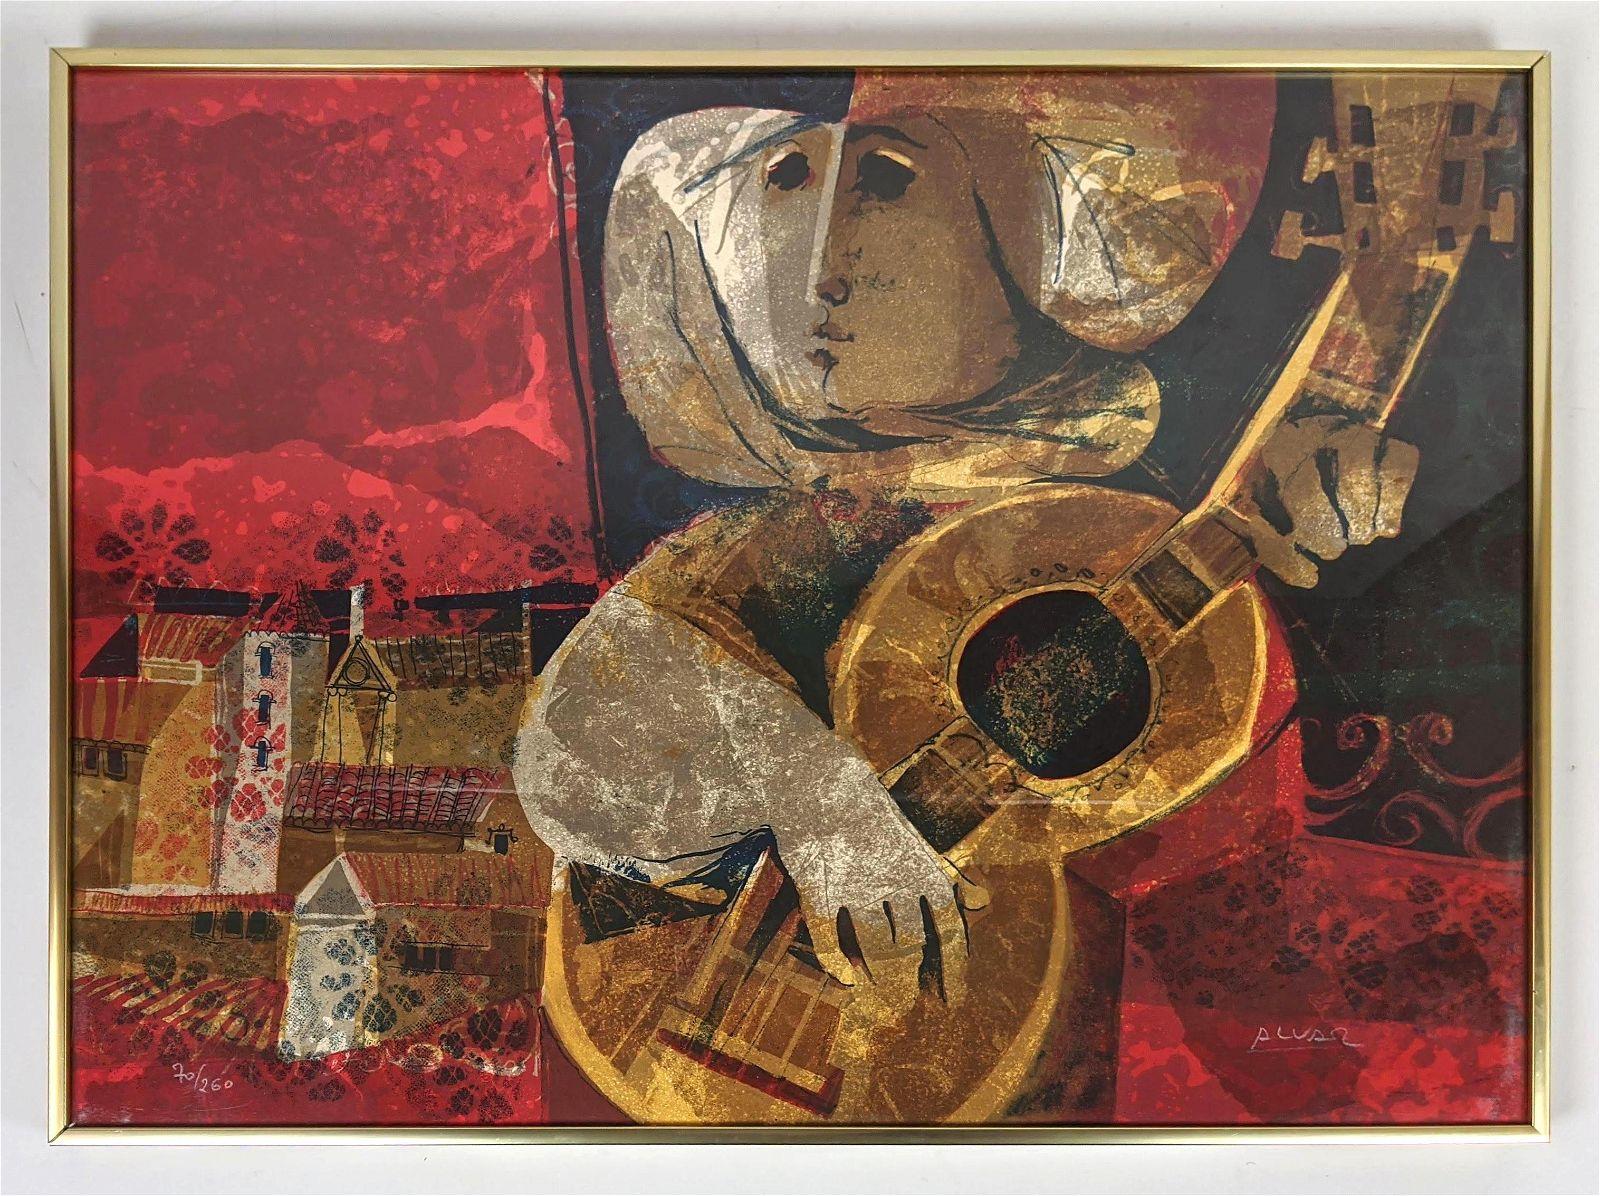 ALVAR SUNOL MUNOZ-RAMOS Lithograph Print. Signed and N